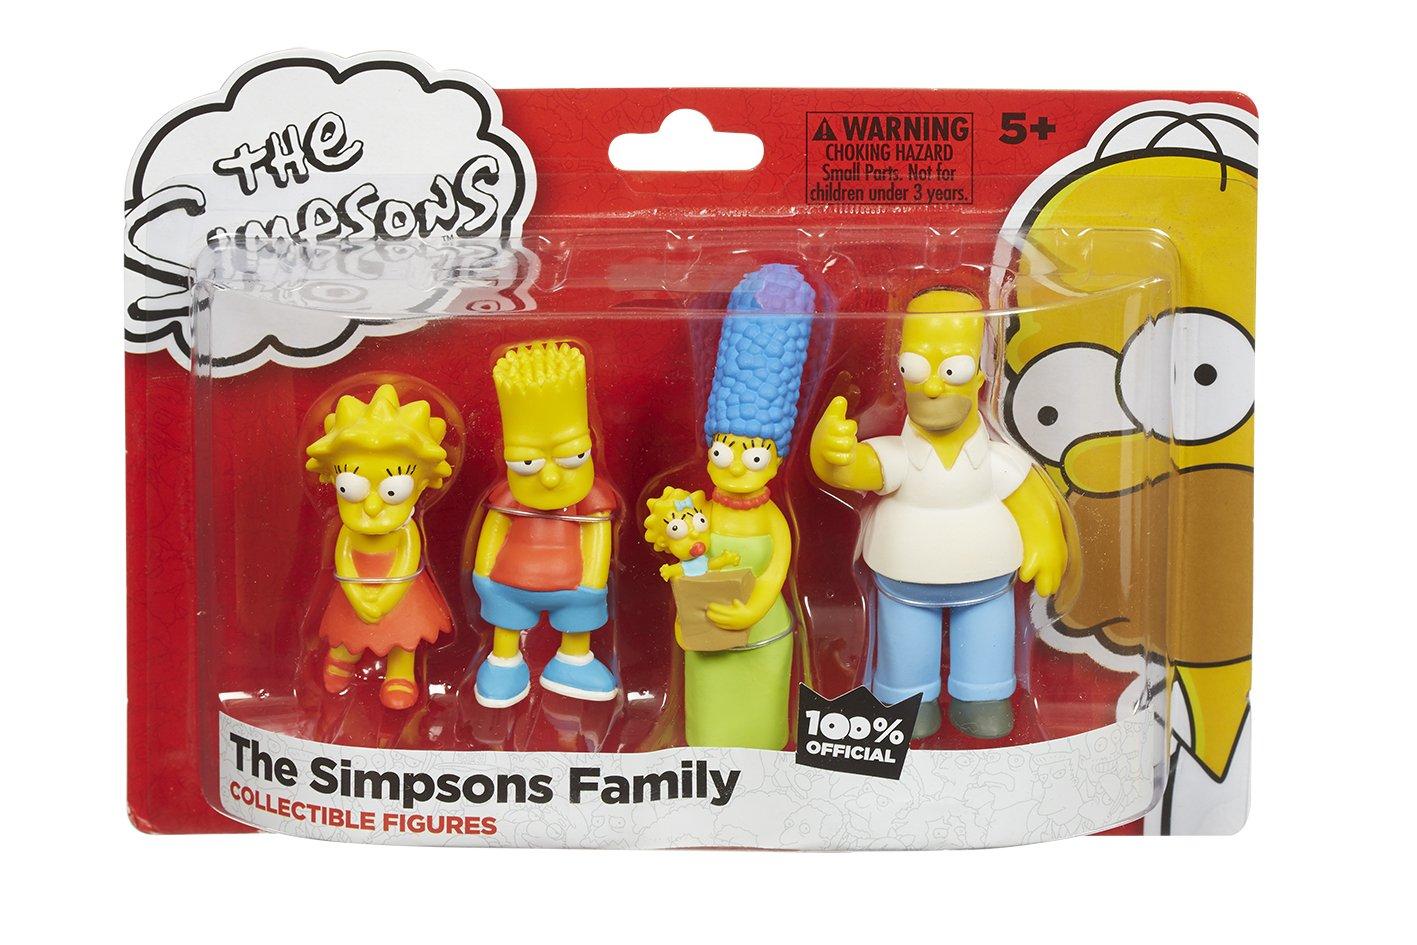 Los Simpsons familia - figuras 4p Pack - Homer, Marge, Bart y Lisa [